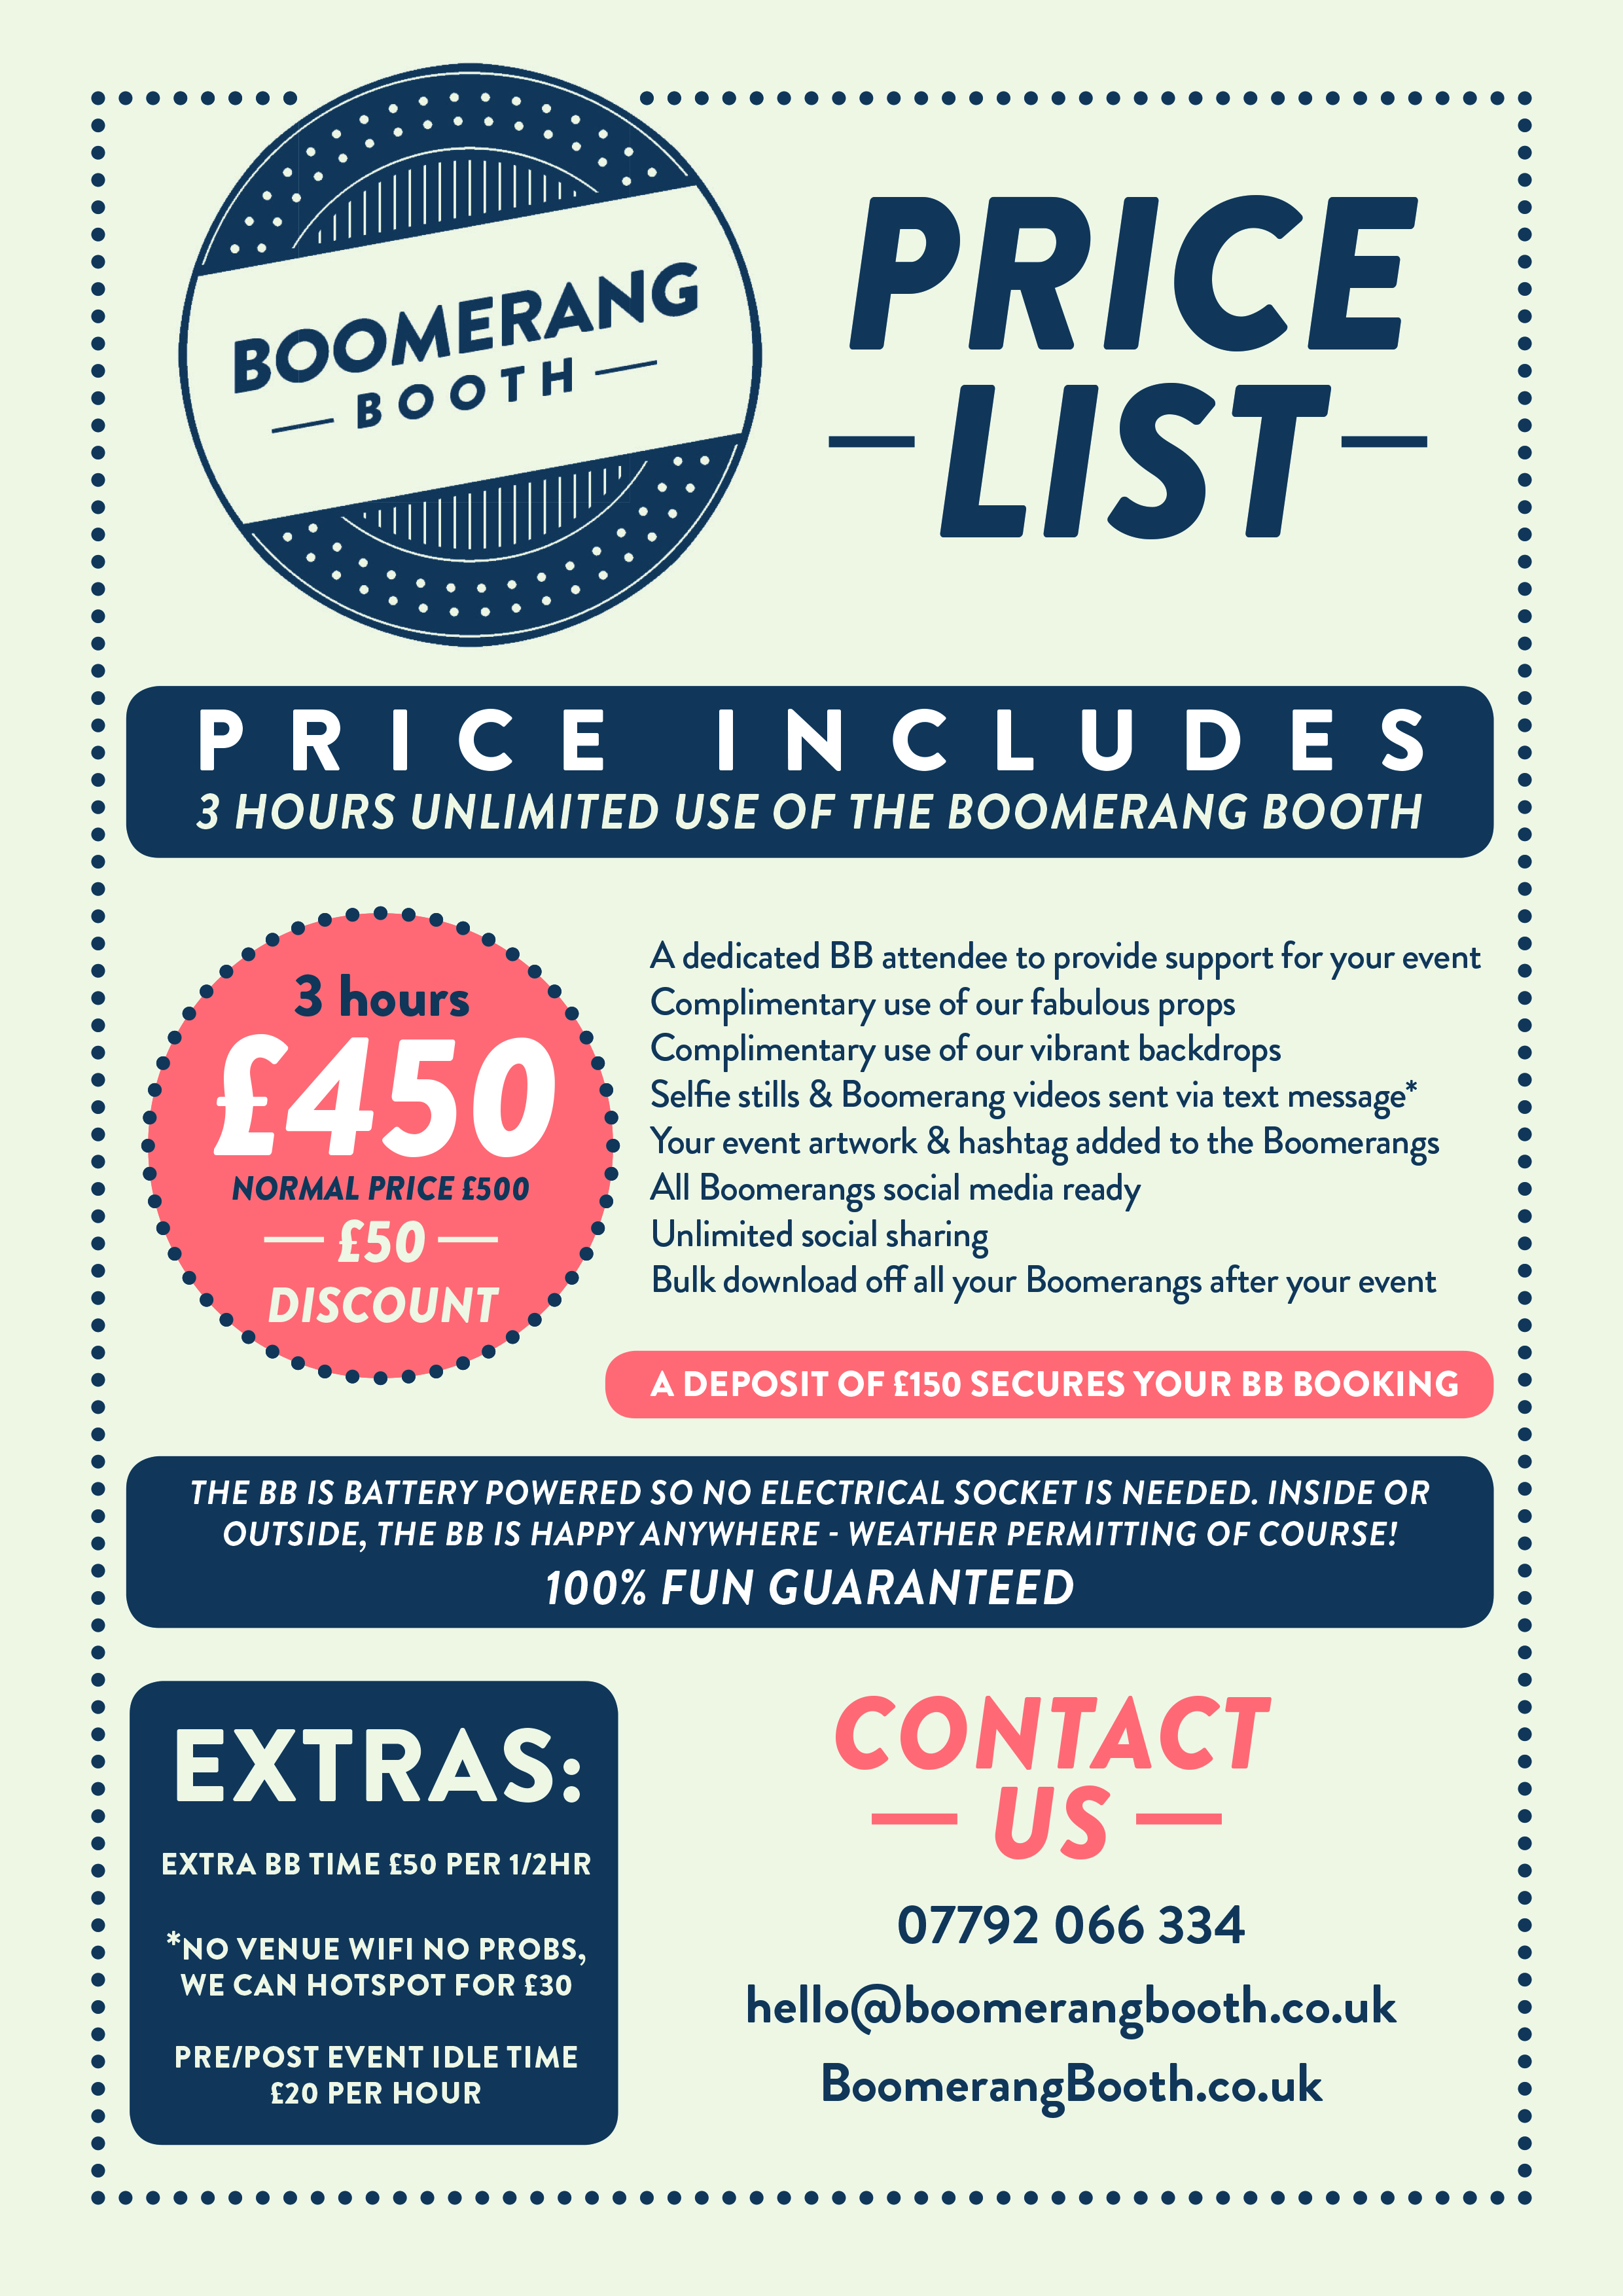 BB Price List